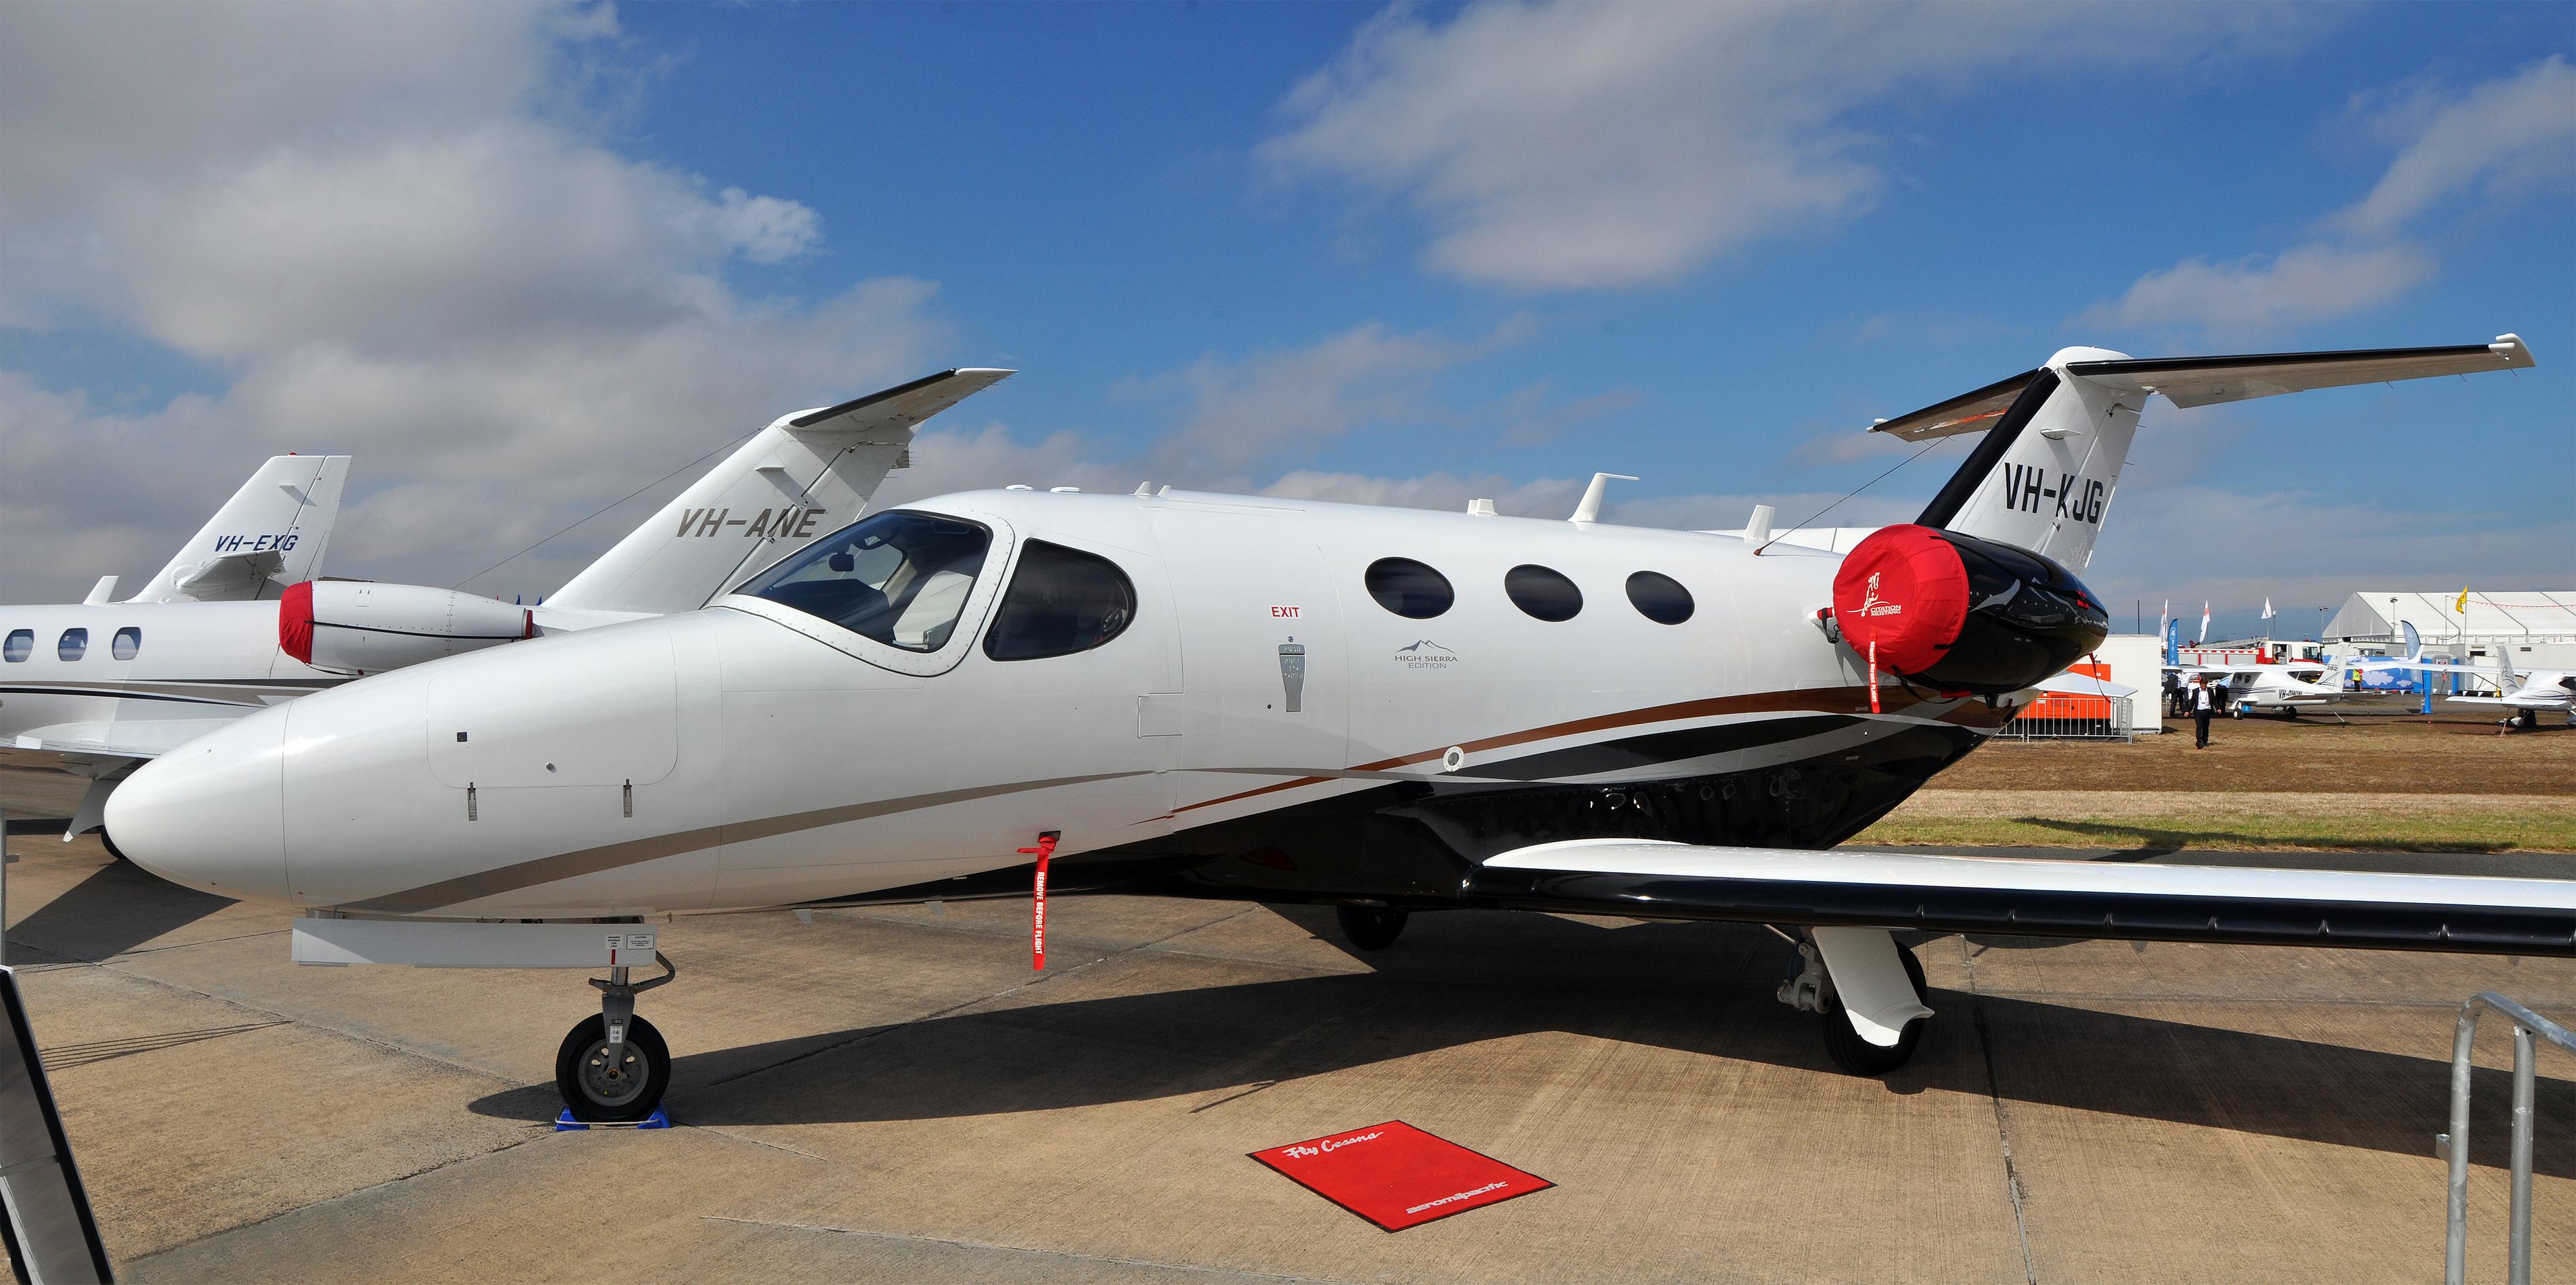 File:VH-KJG Cessna 510 Citation Mustang 'High Sierra Edition ...